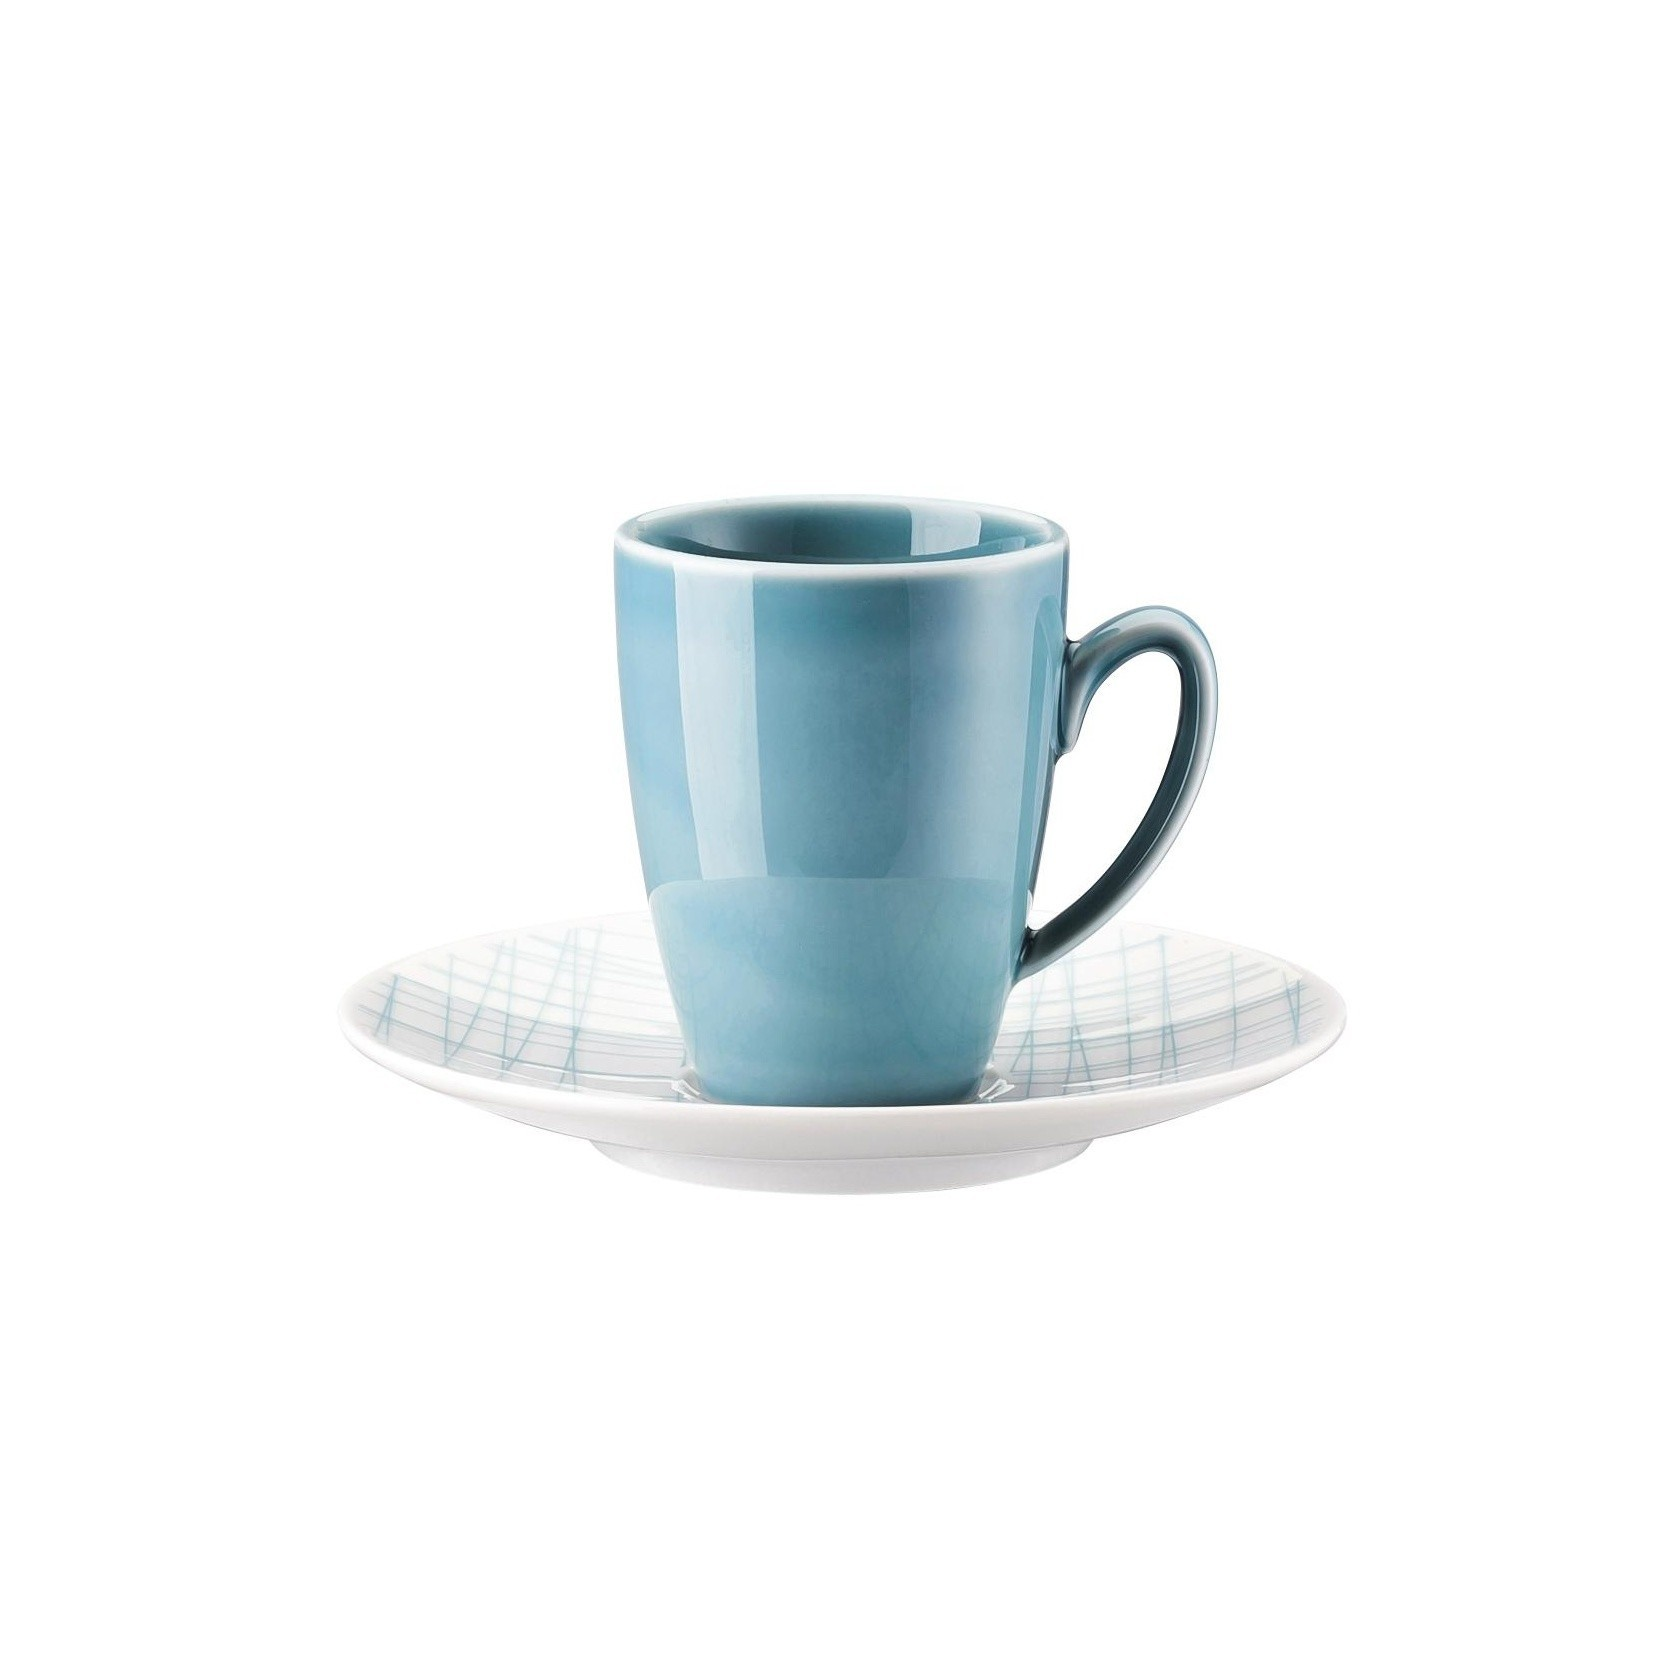 751787d8c2 Rosenthal - Rosenthal Mesh Line Espressotasse+Untertasse - weiß/blau  aqua/glänzend/mikrowellengeeignet/